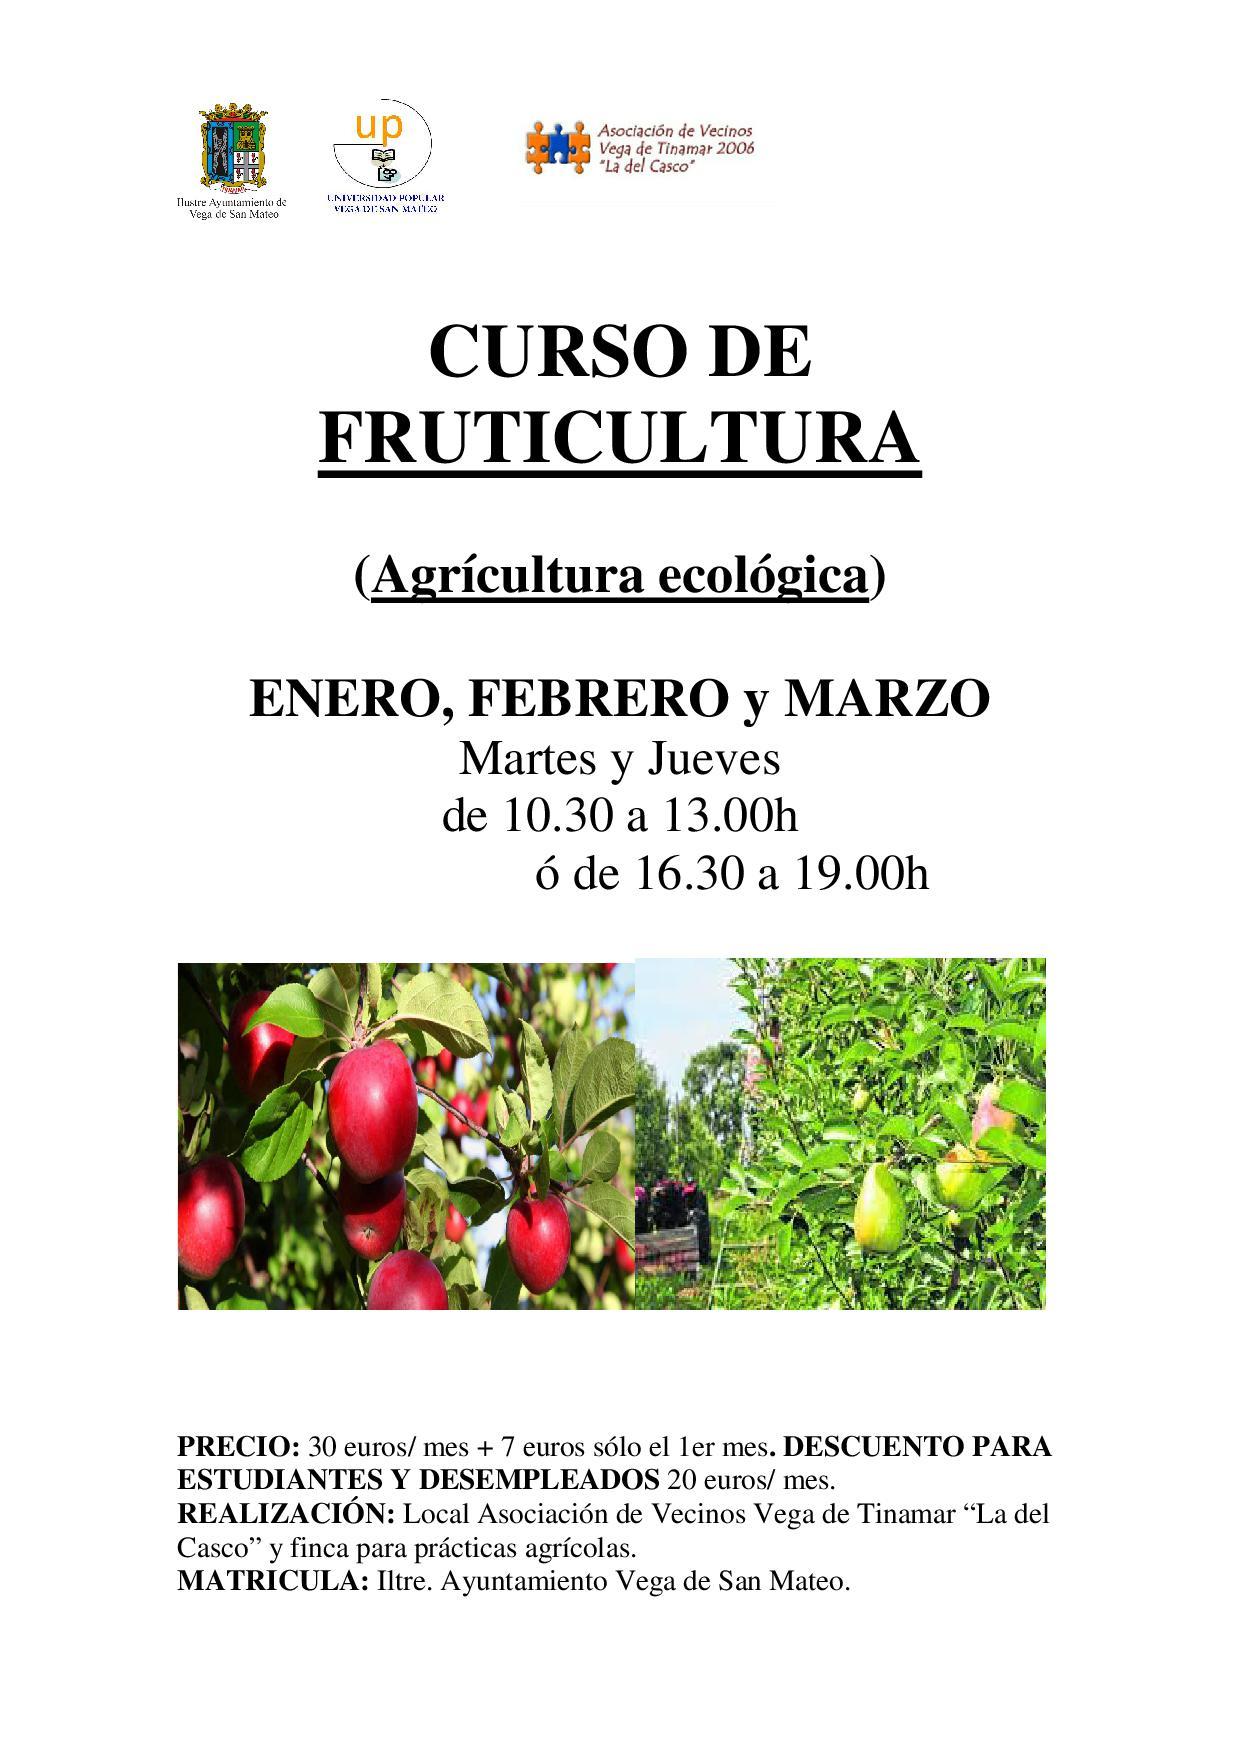 CURSO Fruticultura up san mateo noticias de san mateo